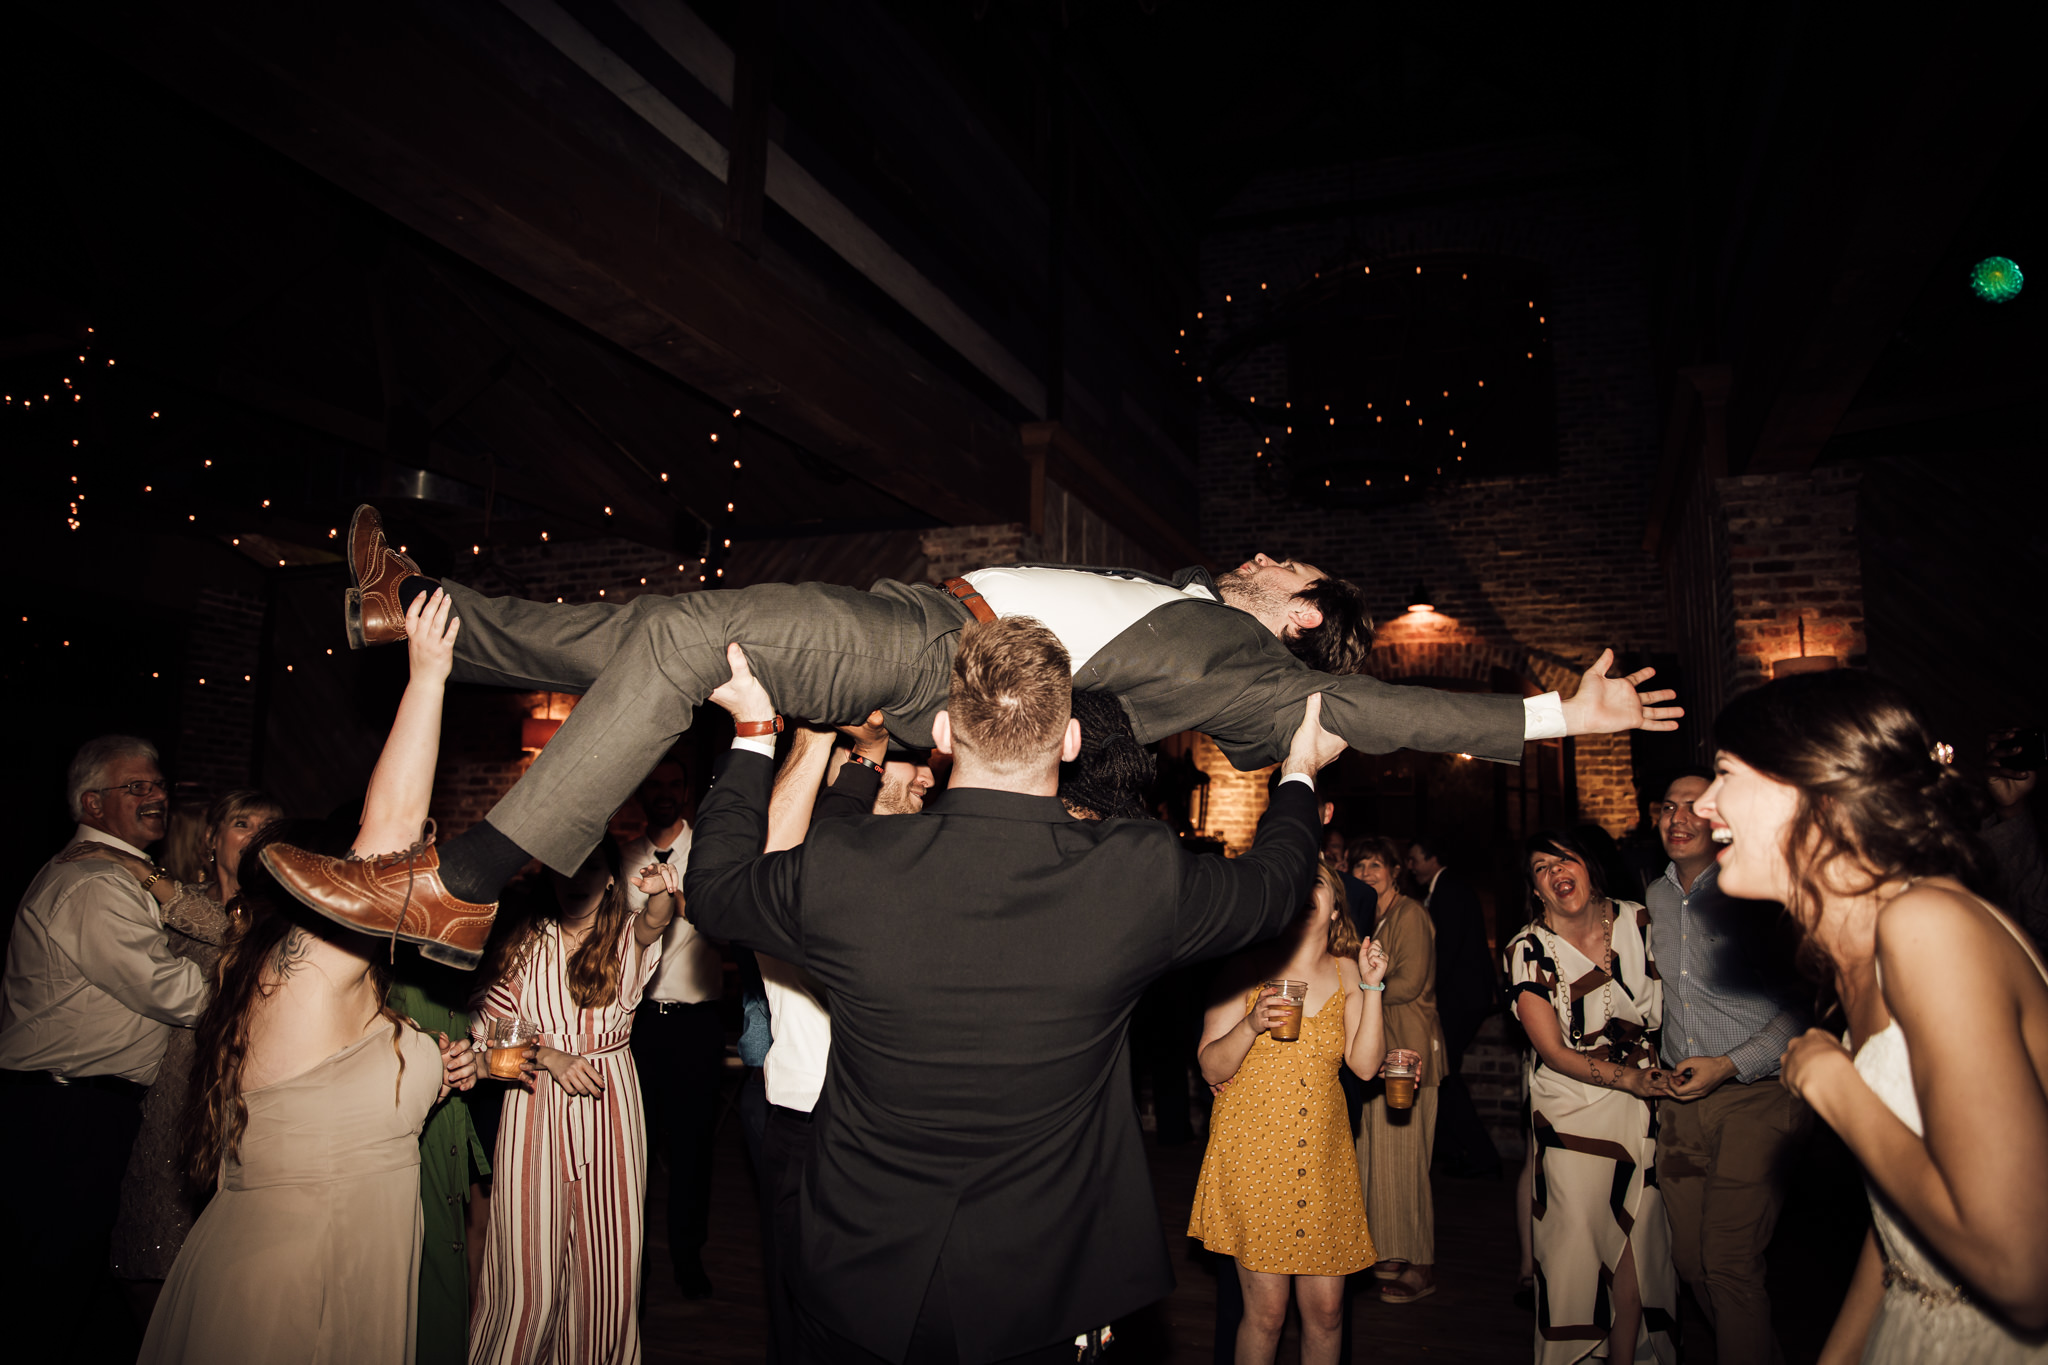 phantom-canyon-brewery-colorado-springs-wedding-photographer-483.jpg